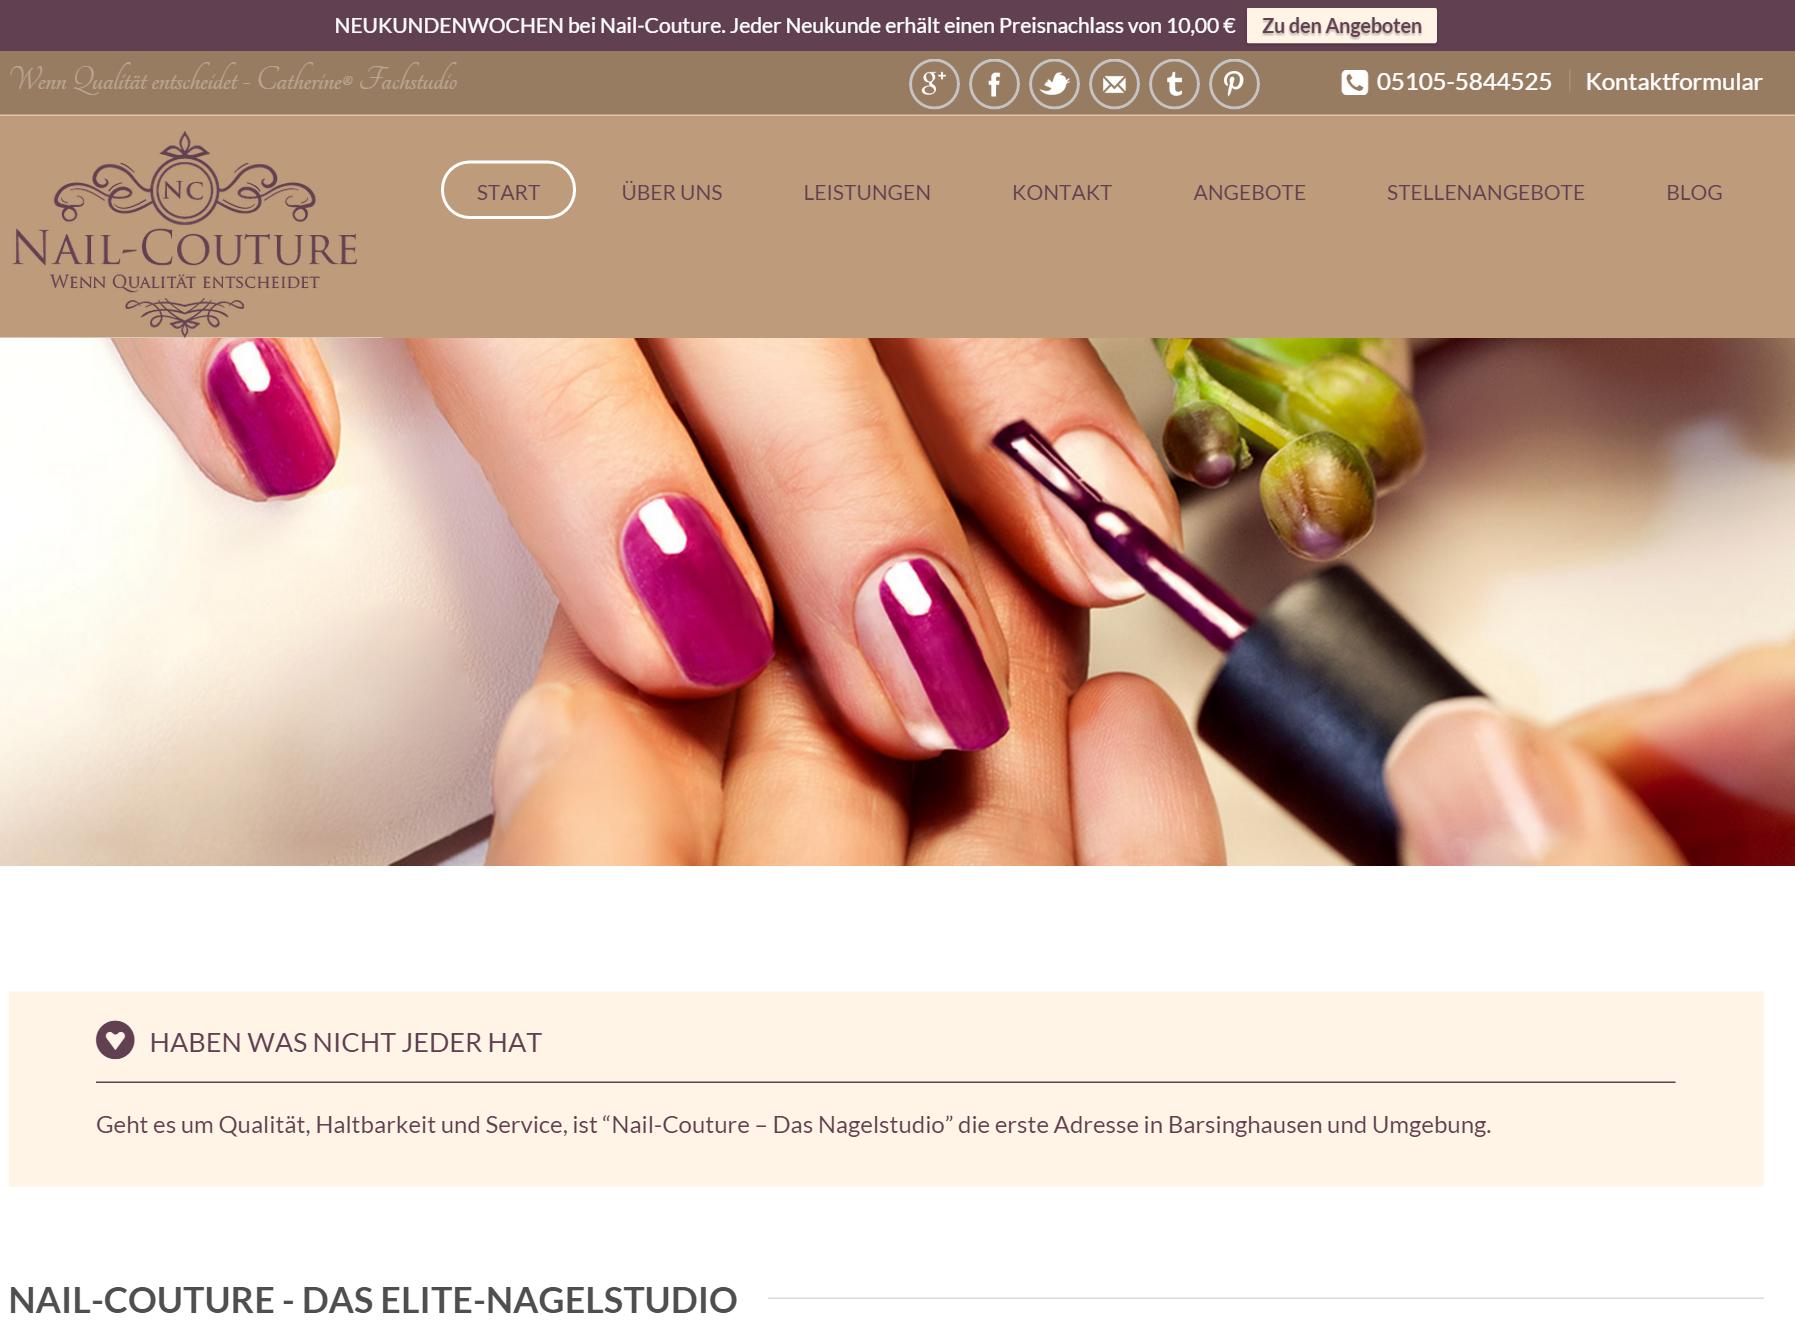 NAgelstudio Nail-Couture Barsinghausen